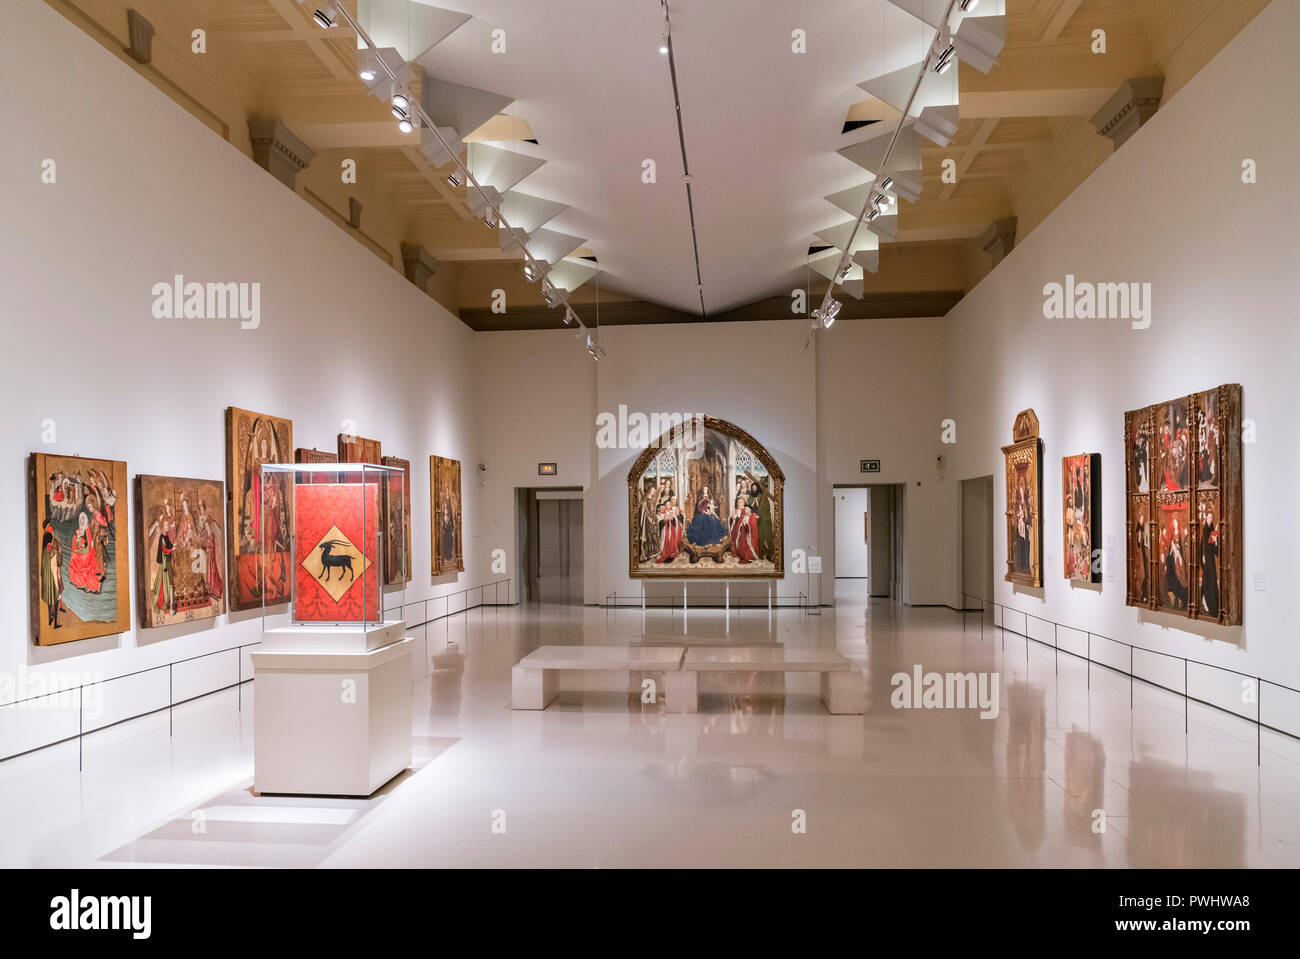 Das nationale Kunstmuseum von Katalonien - Museu Nacional d'Art de Catalunya (MNAC) - Parc de Montjuïc, Barcelona, Spanien. Stockbild